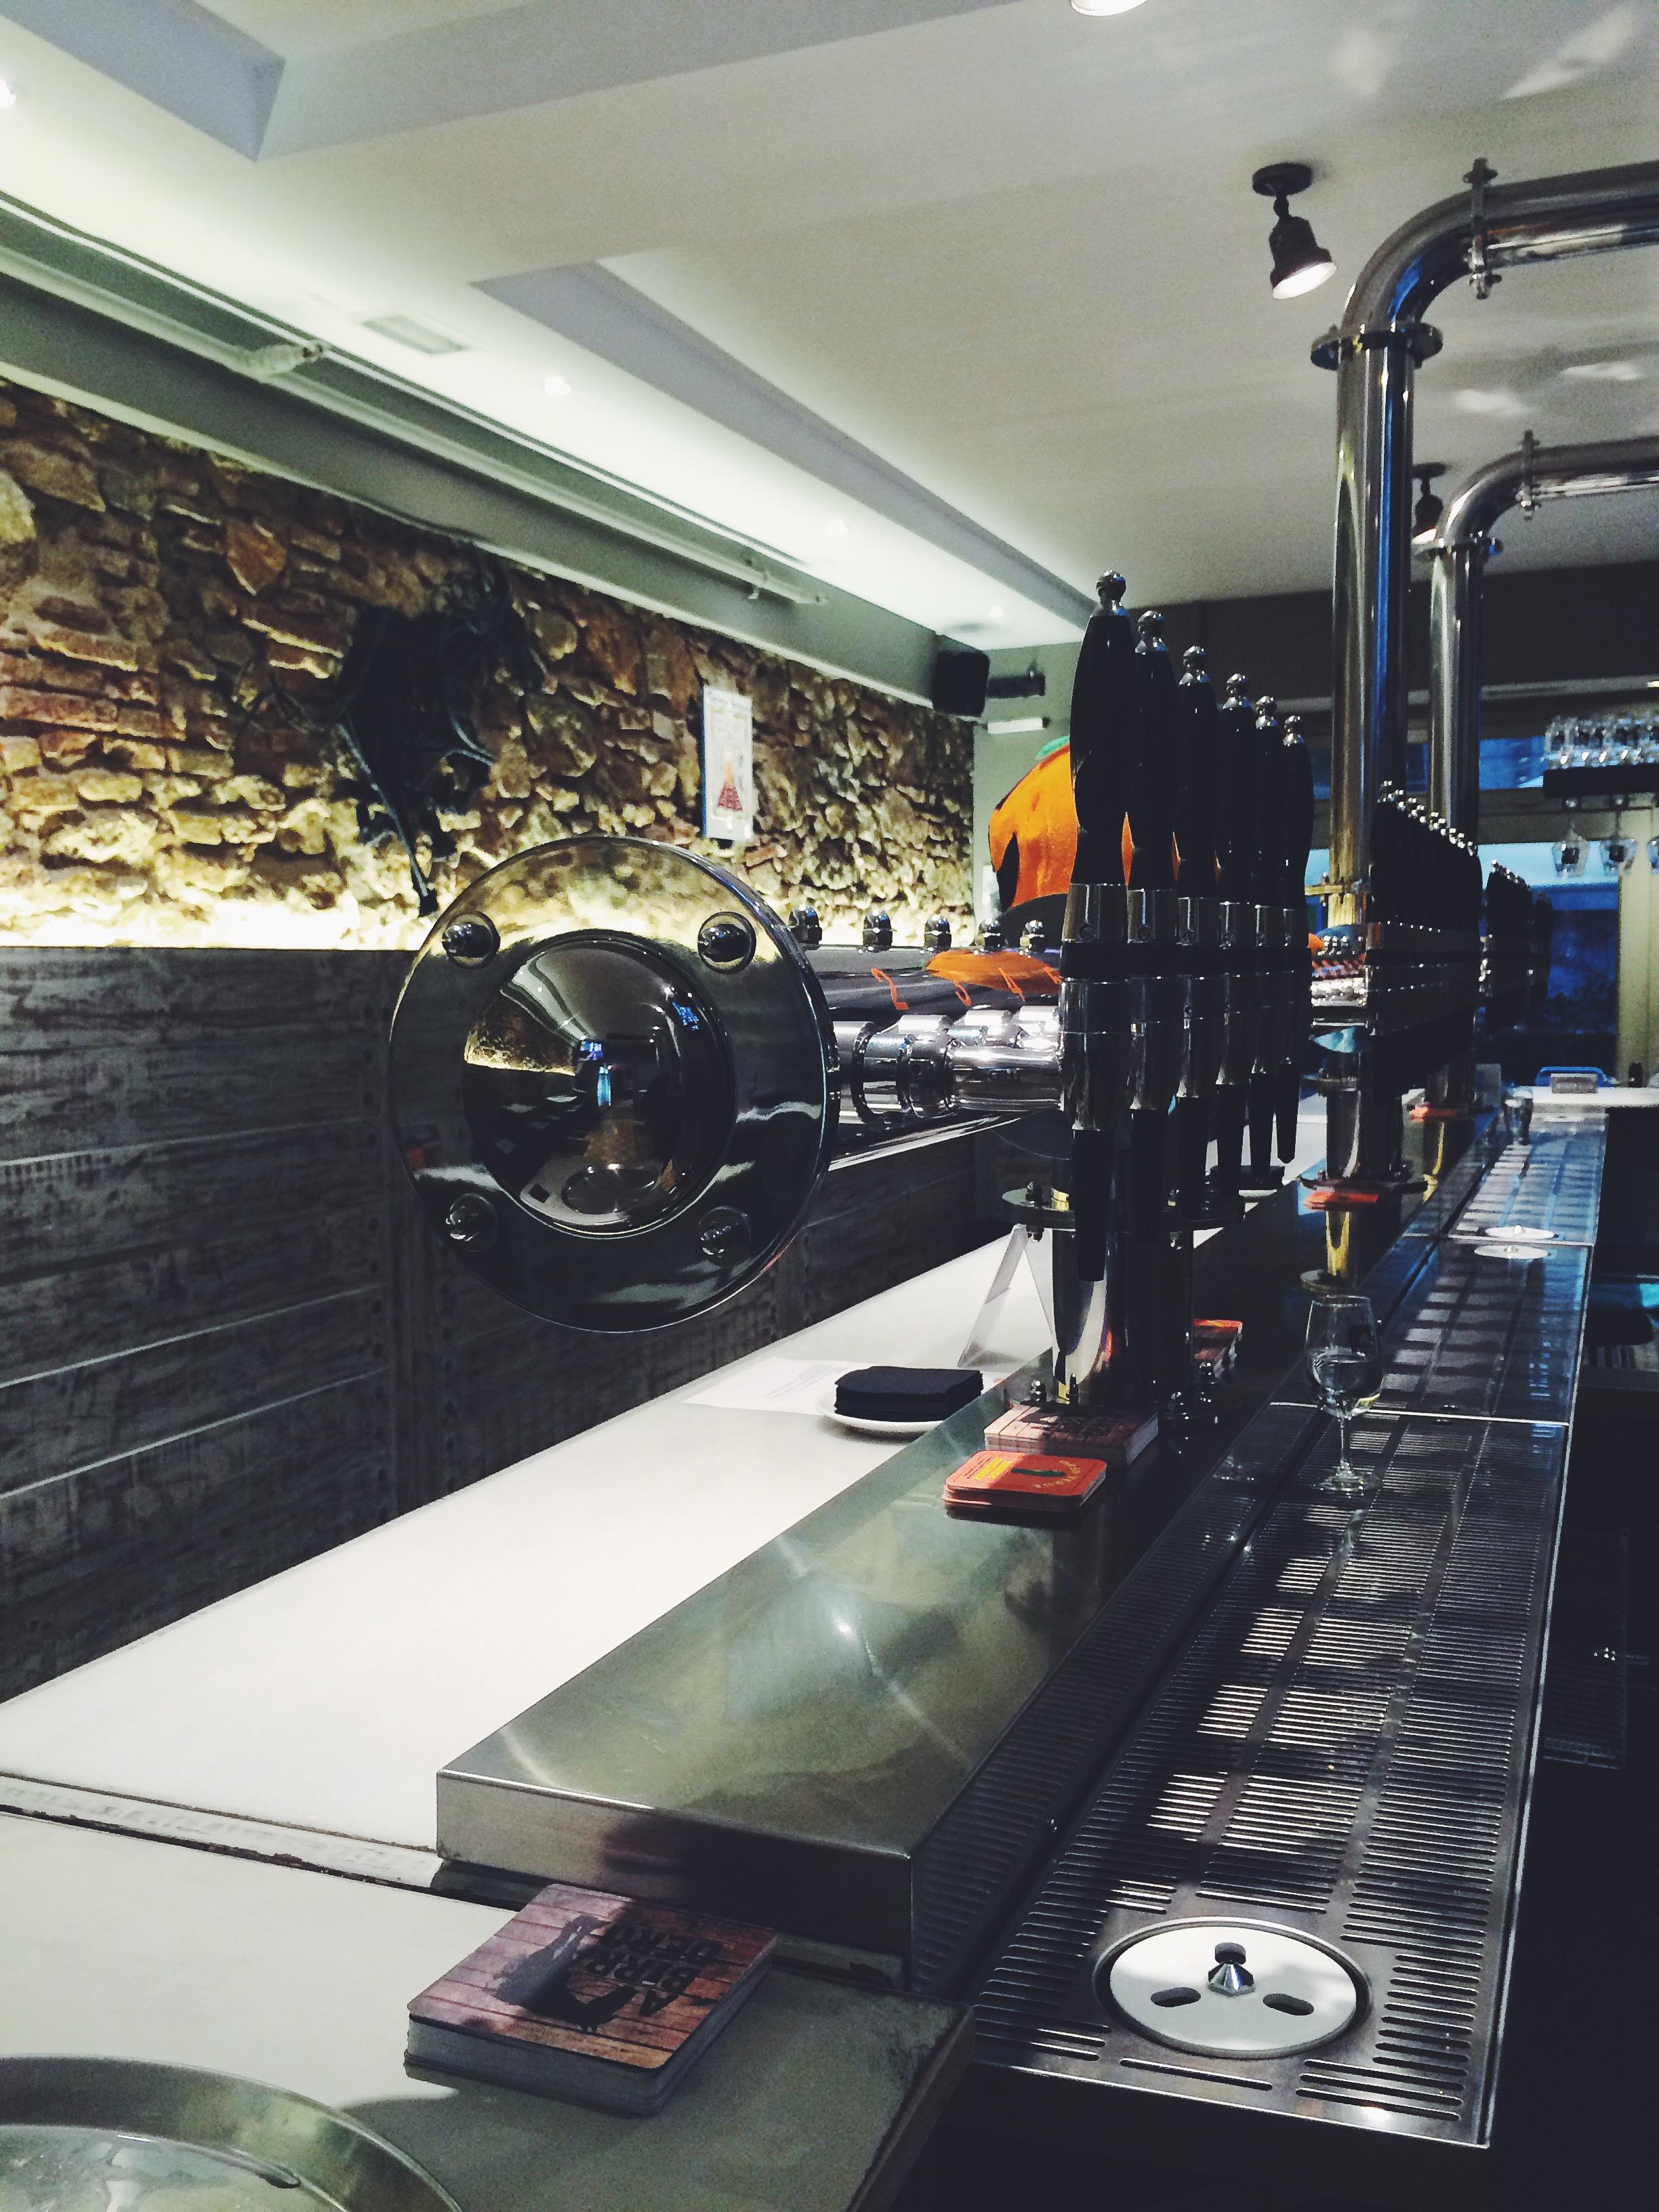 Abirradero craft beer bar, Barcelona